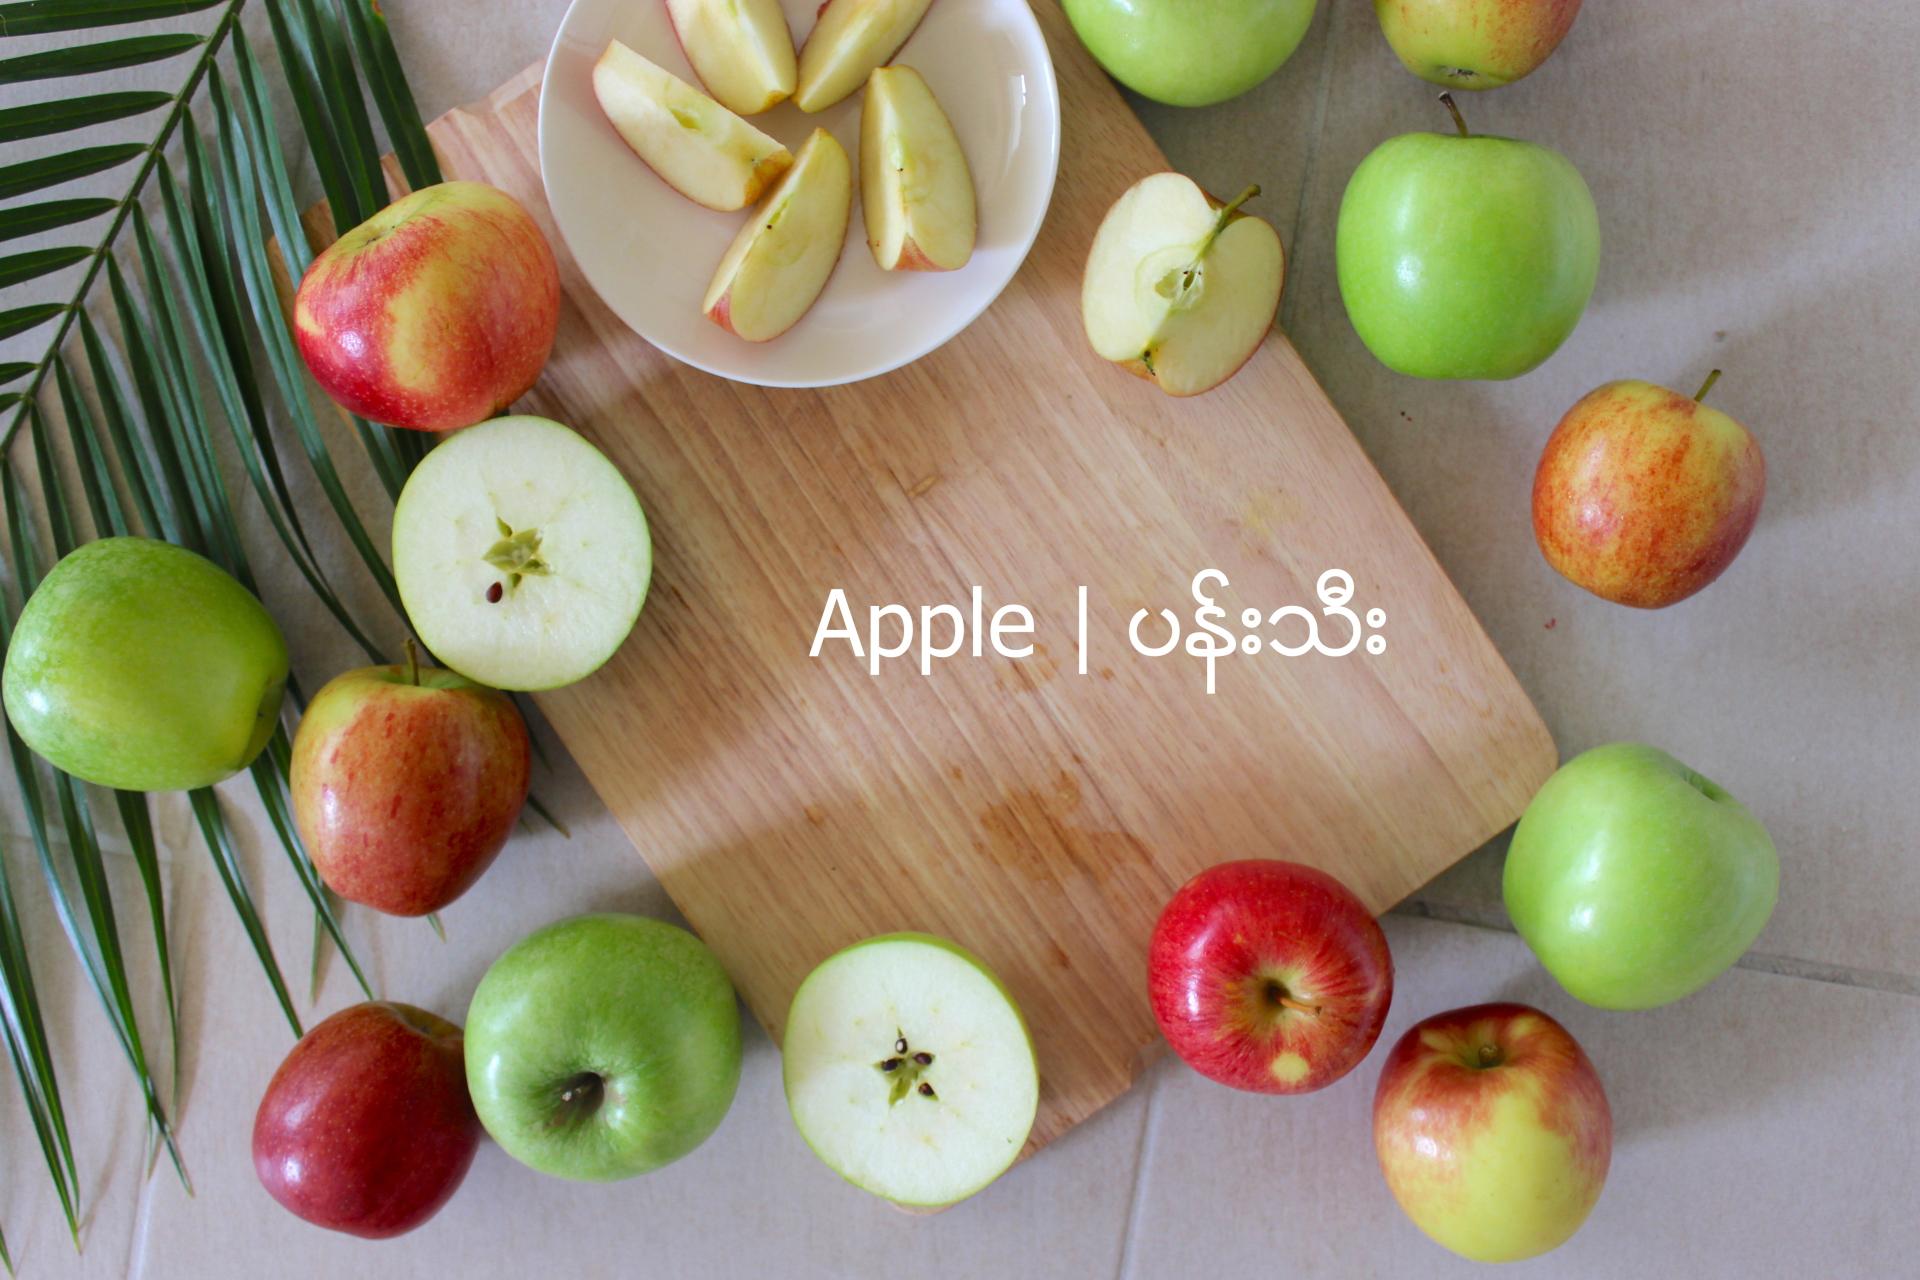 Apple | ပန္းသီး